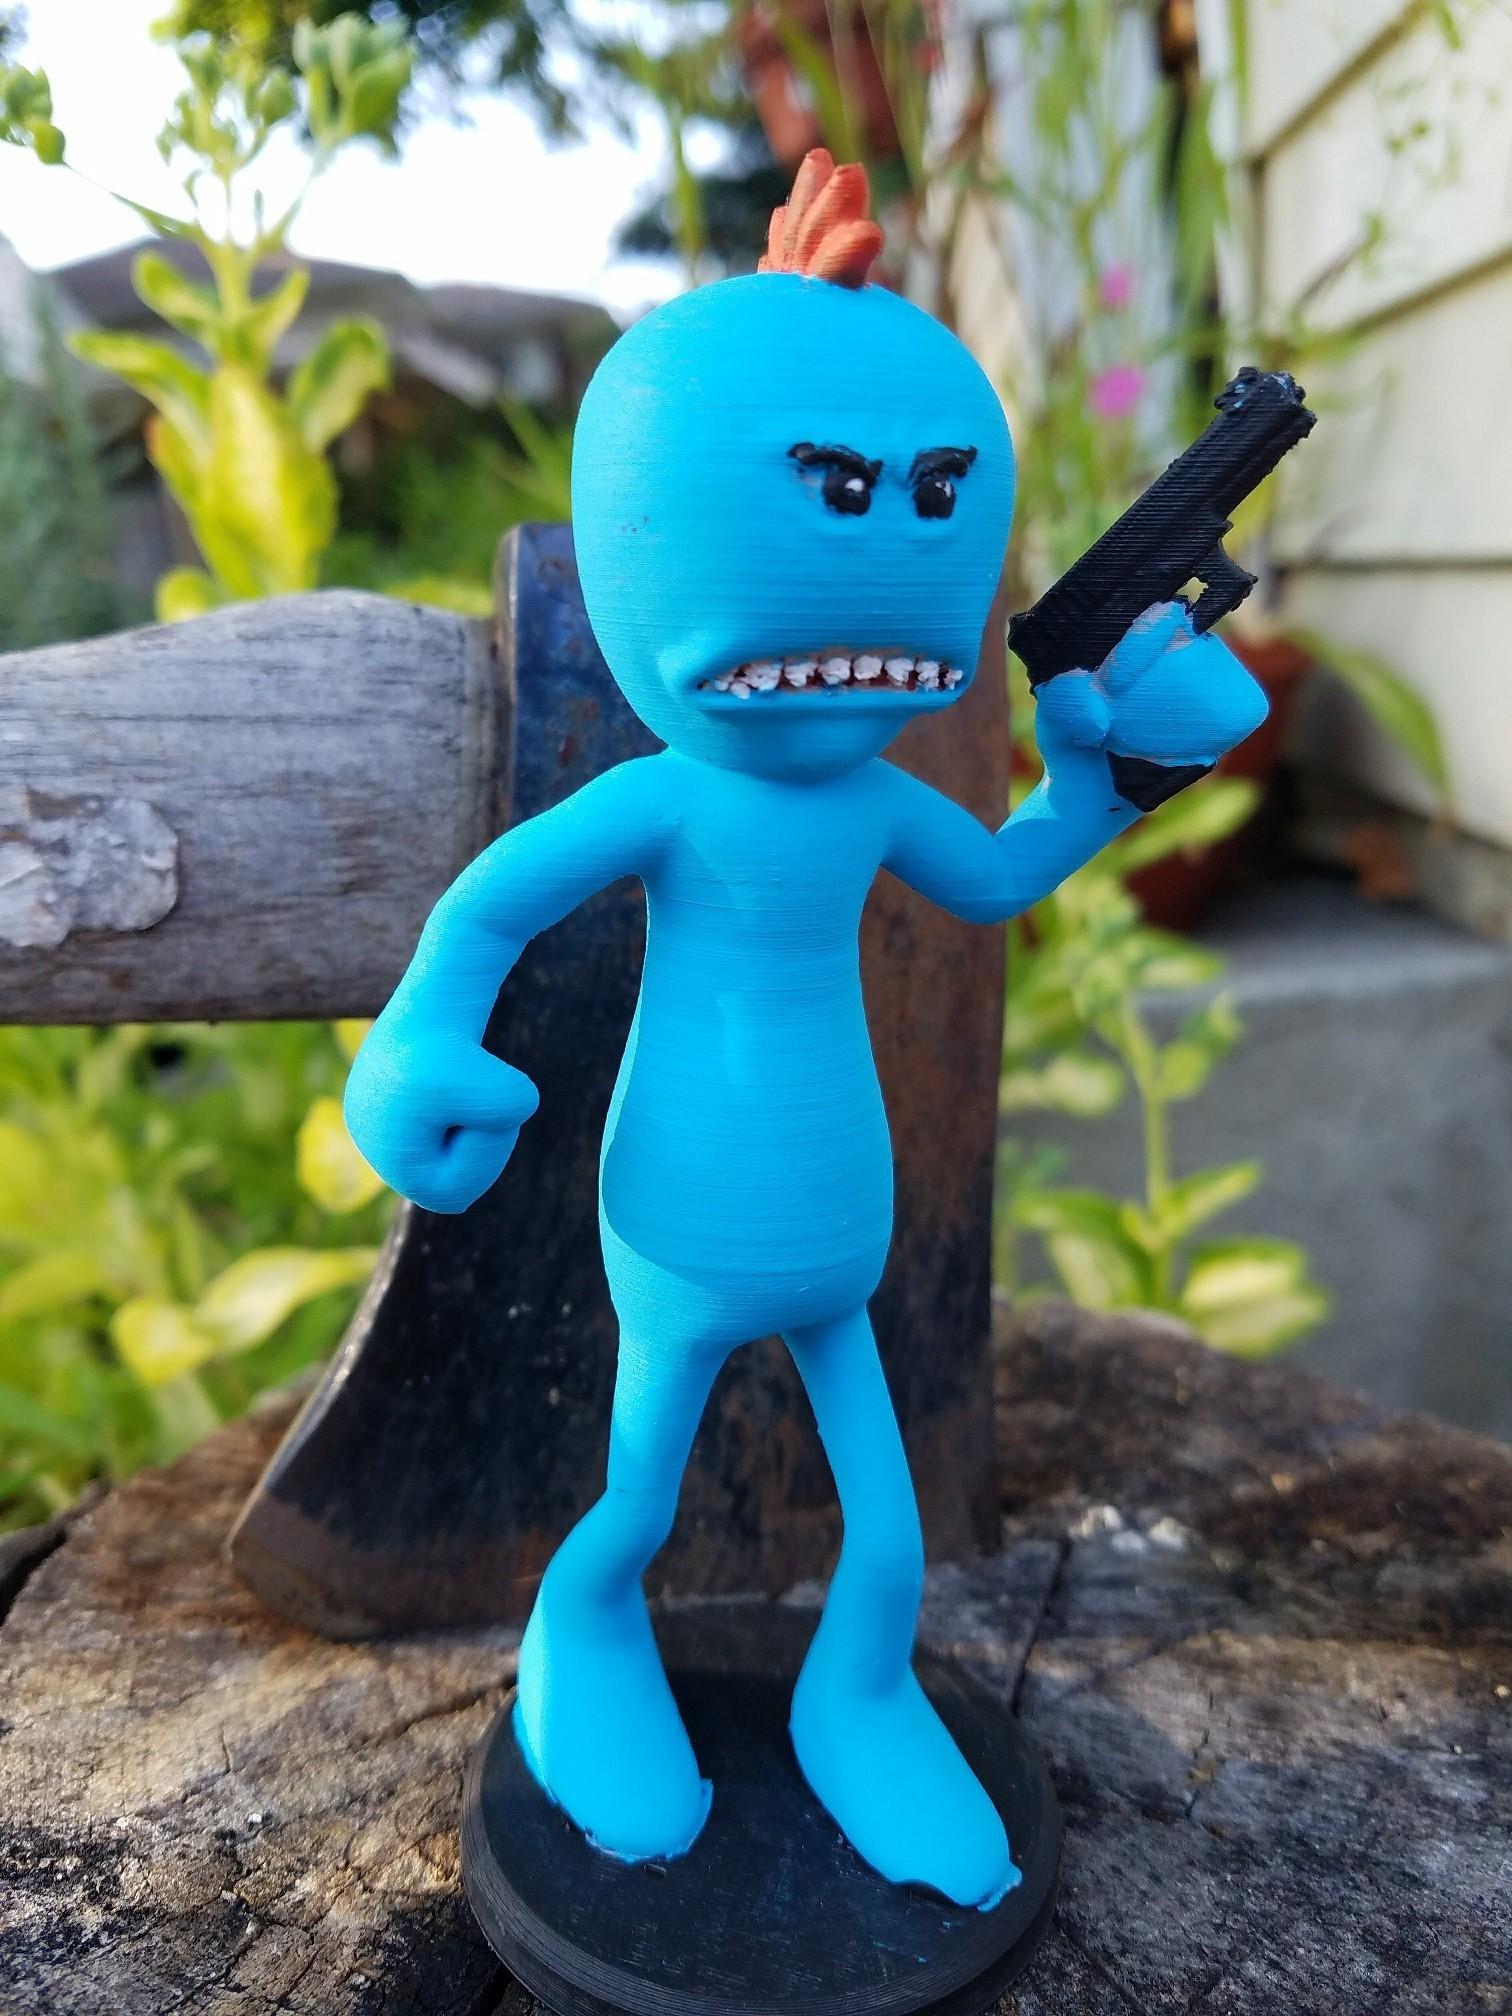 20170815_183257.jpg Download free STL file Rick and Morty assortment of Mr. Meeseeks • 3D printable model, Anthrobones